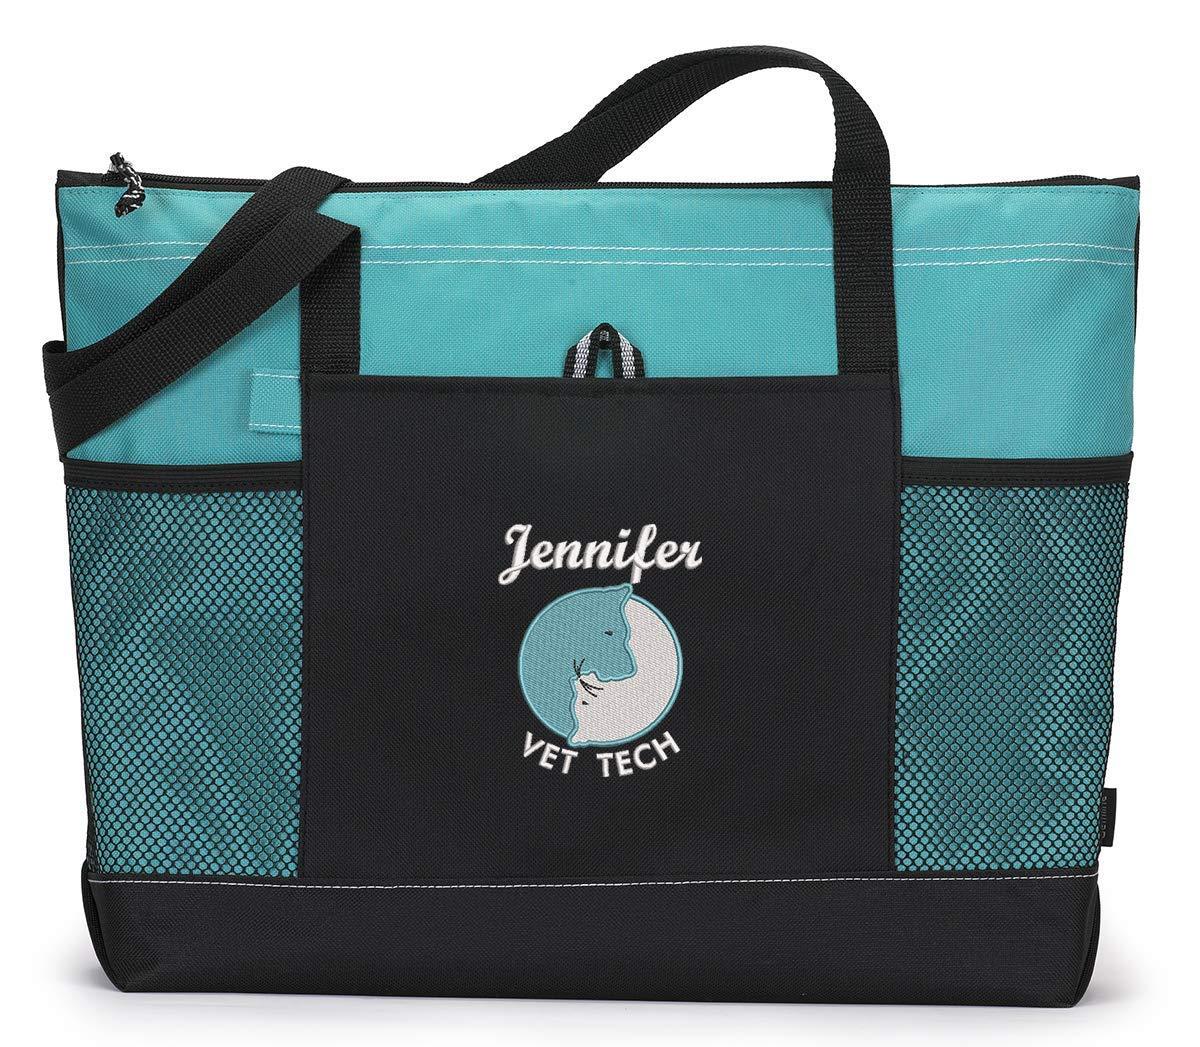 Bargain Veterinarian Vet Tech Tulsa Mall Personalized Embroidered Tote Bag